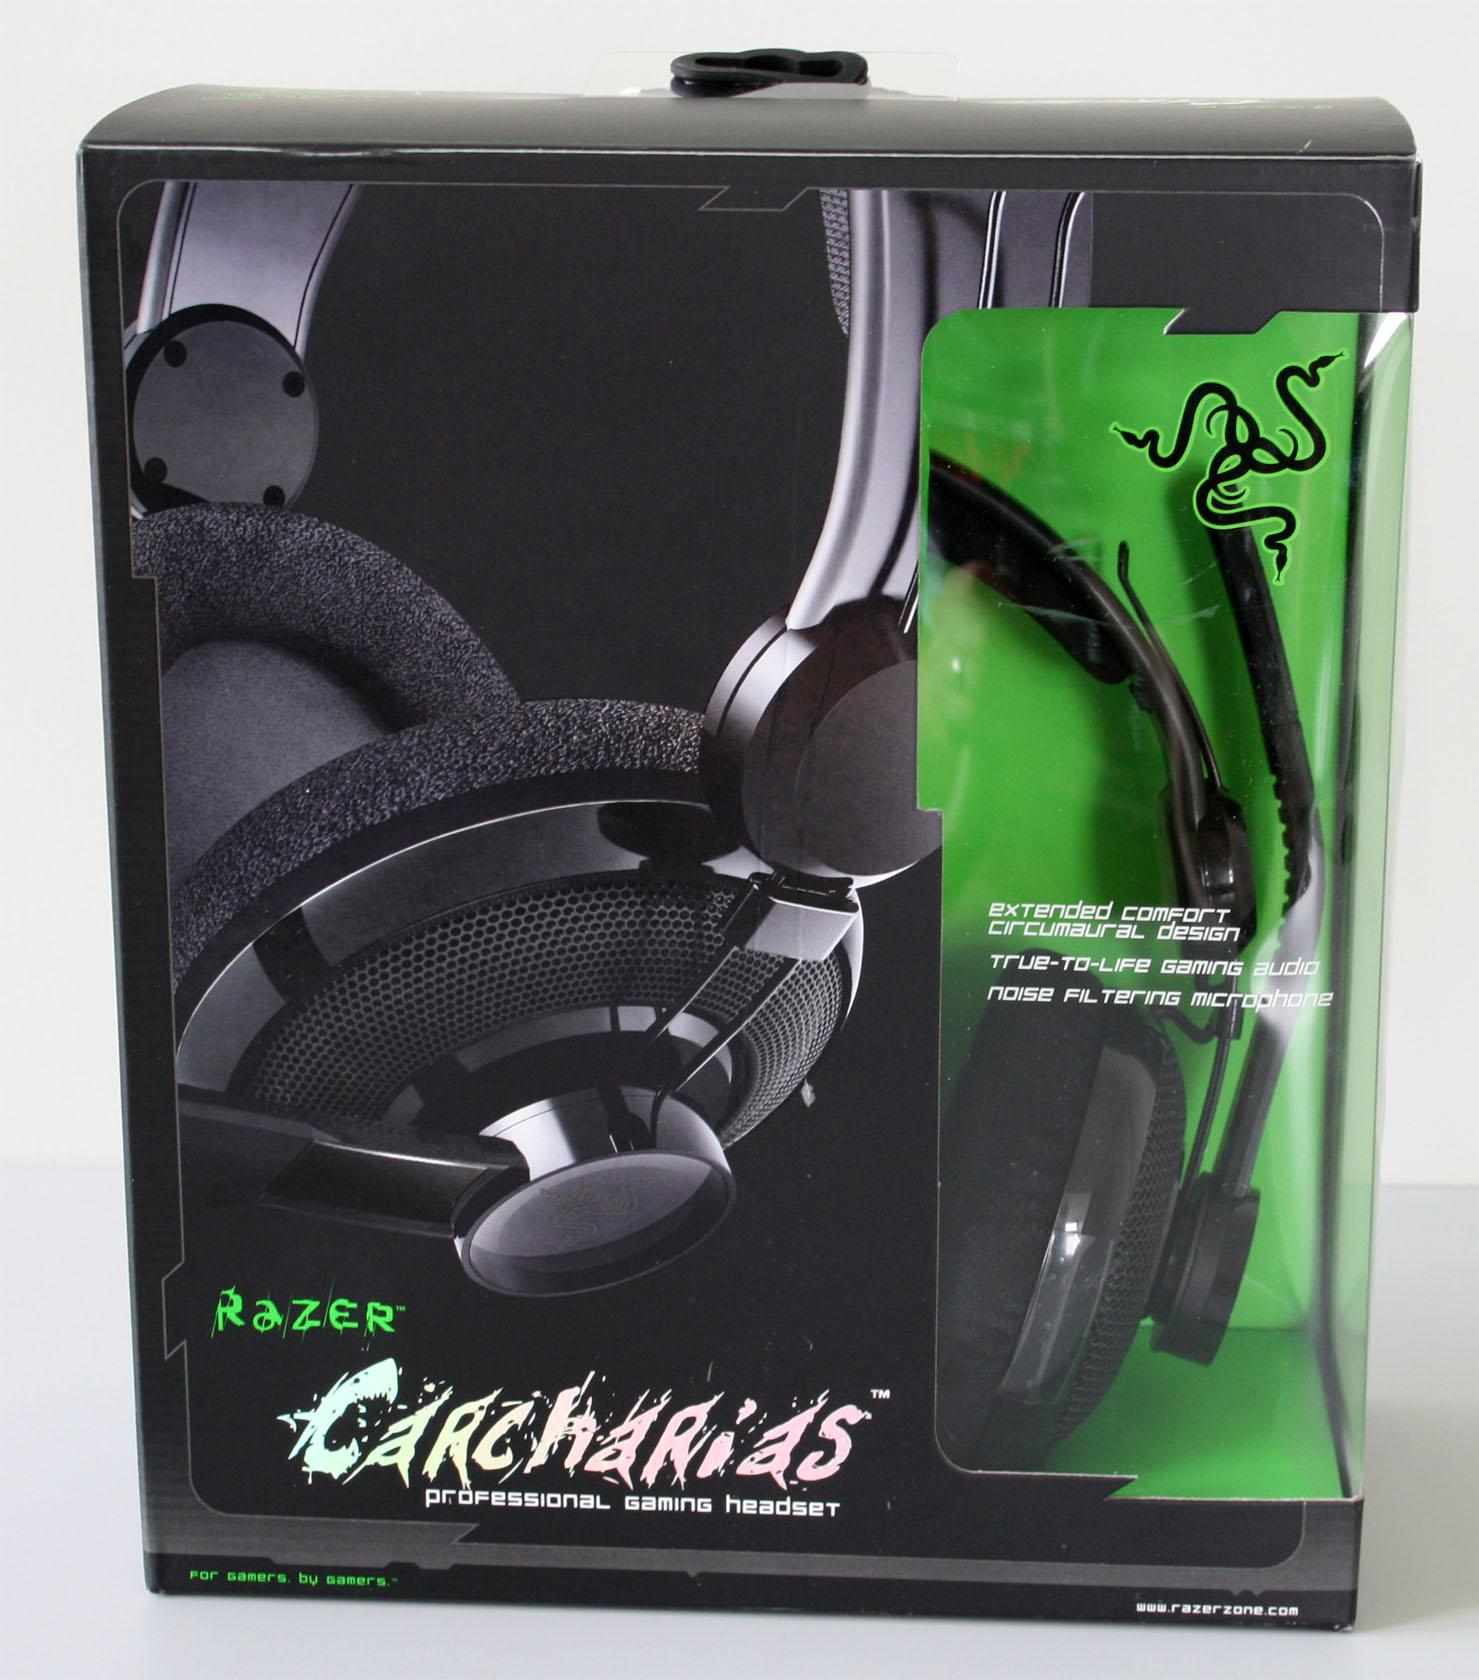 Carcharias Razer Headphones additionally 17X10 5X100 Wheels furthermore Lancia Delta Integrale EVO furthermore 10 8 10 千歳線 島松~北広島 additionally Minecraft Dock. on 1143 html